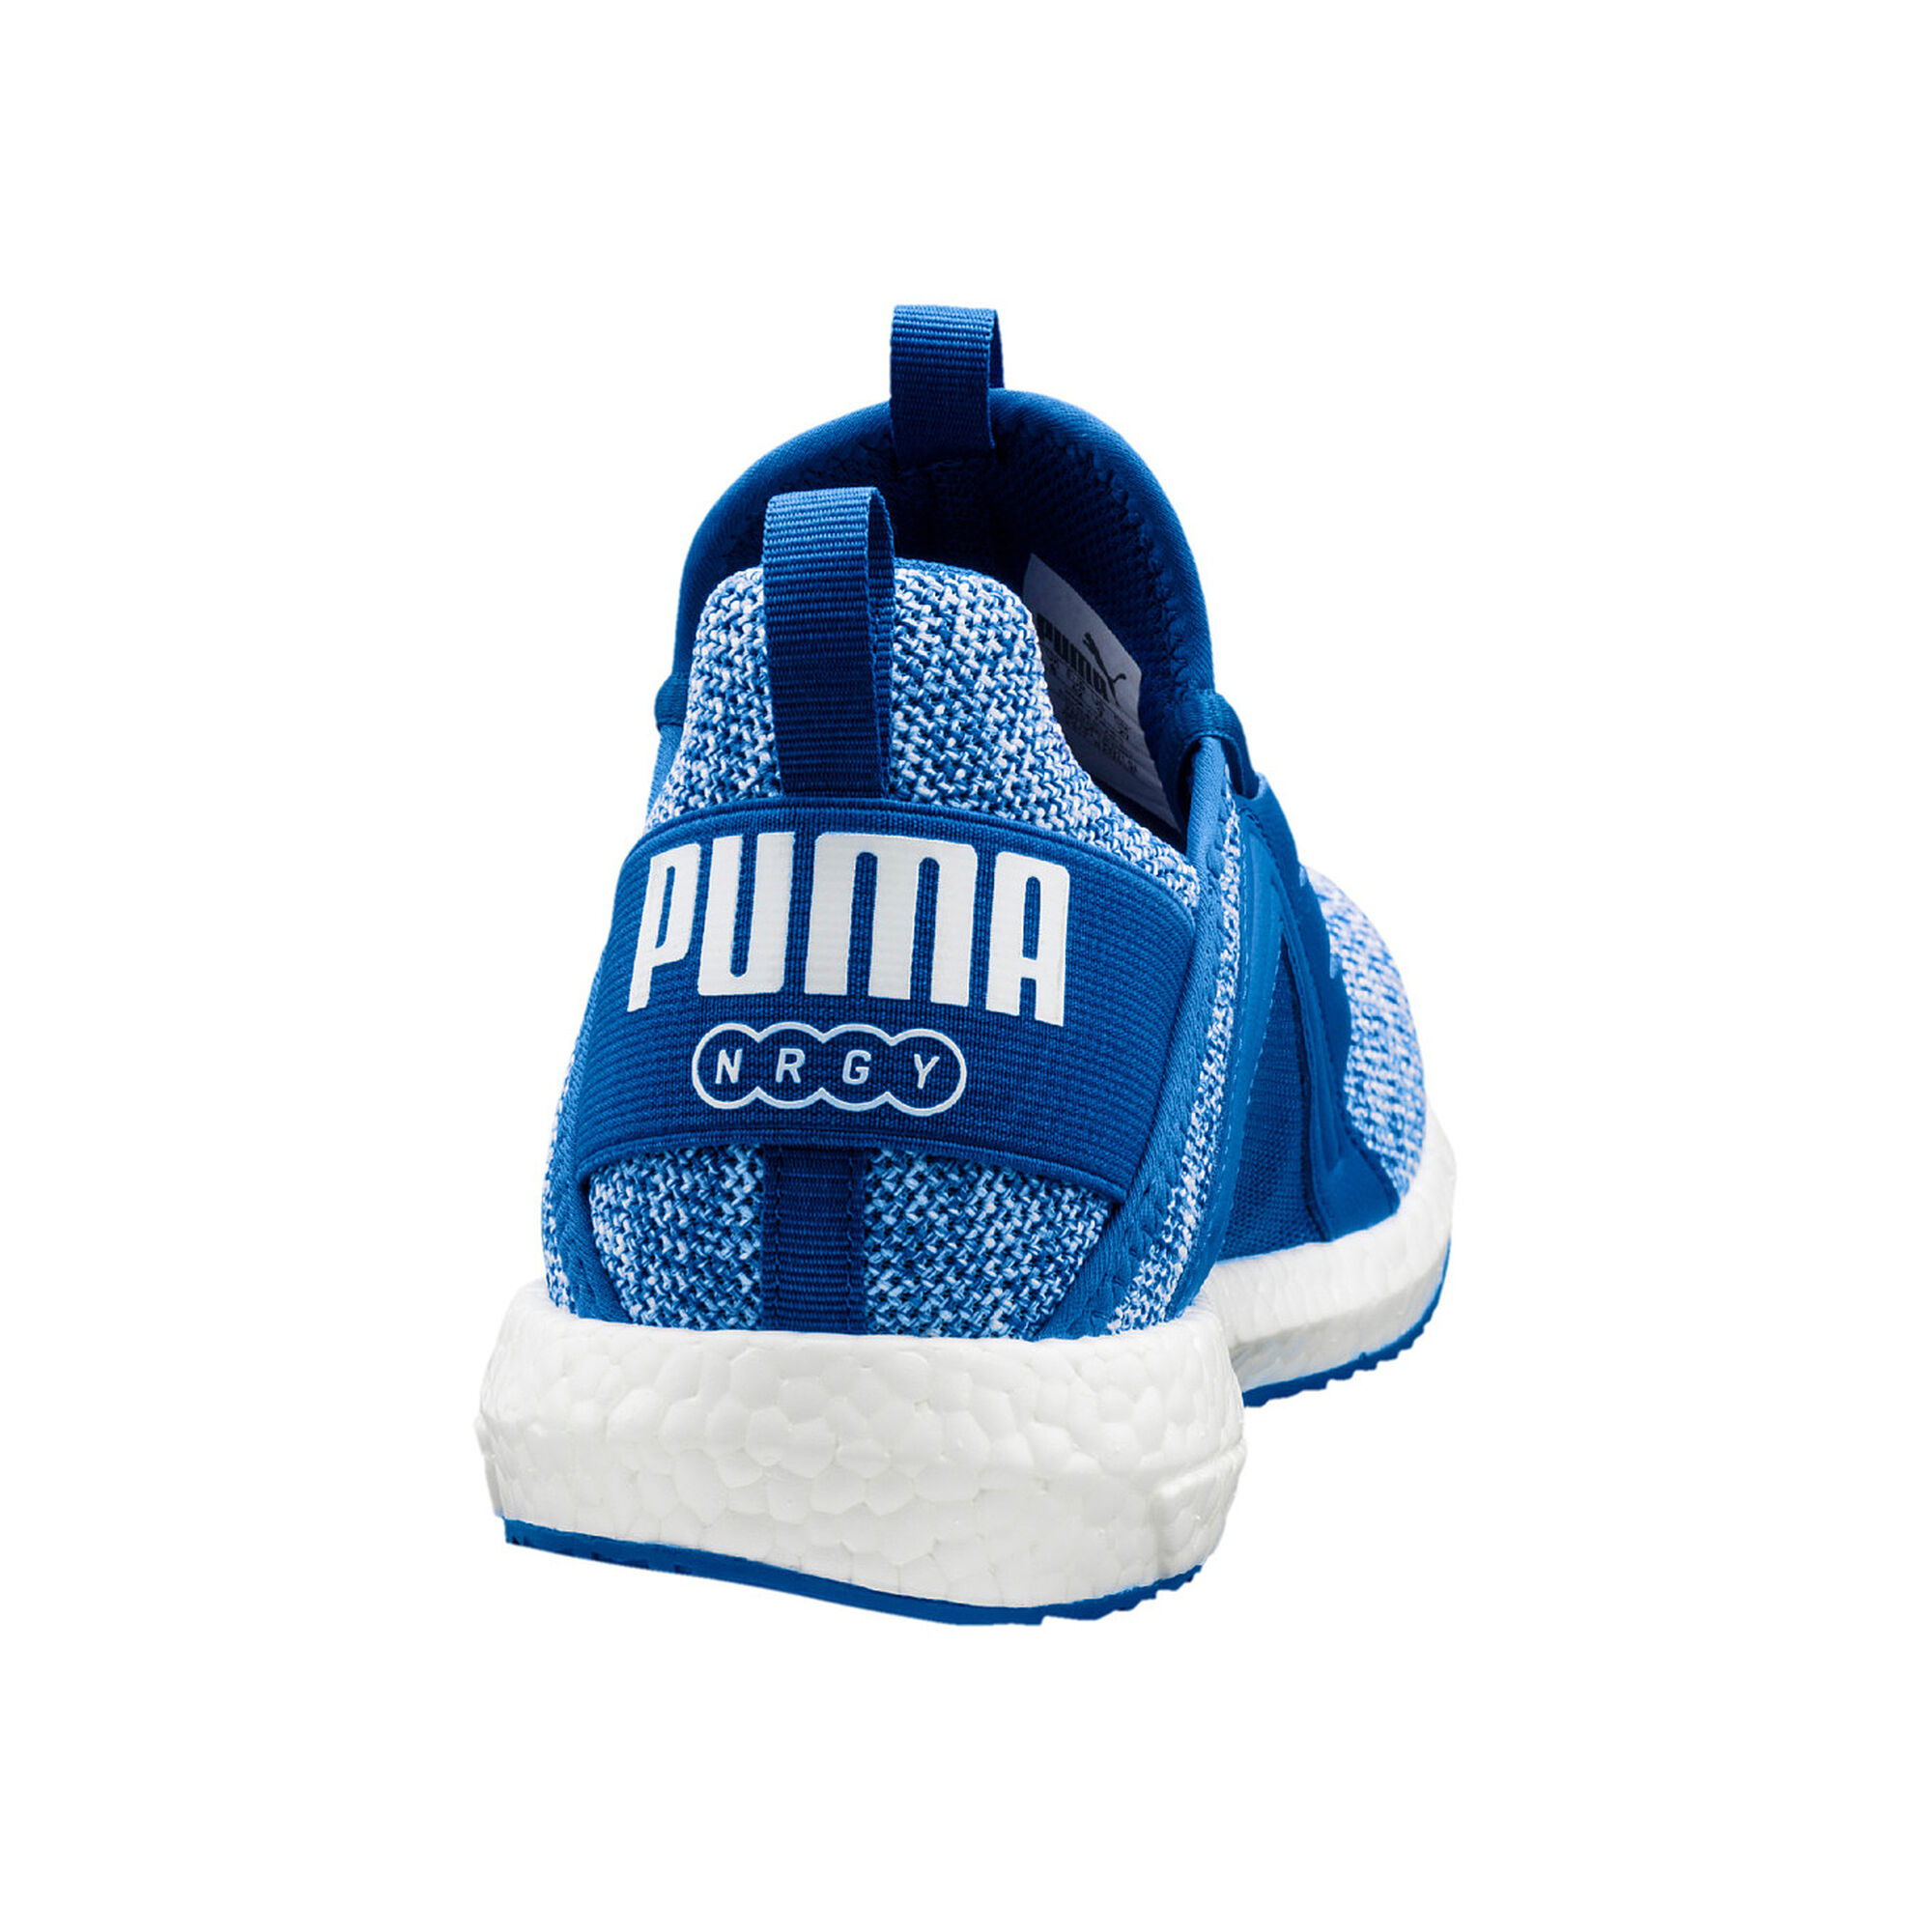 815703243d8248 Puma · Puma · Puma · Puma · Puma · Puma. Mega Energy Knit Men ...